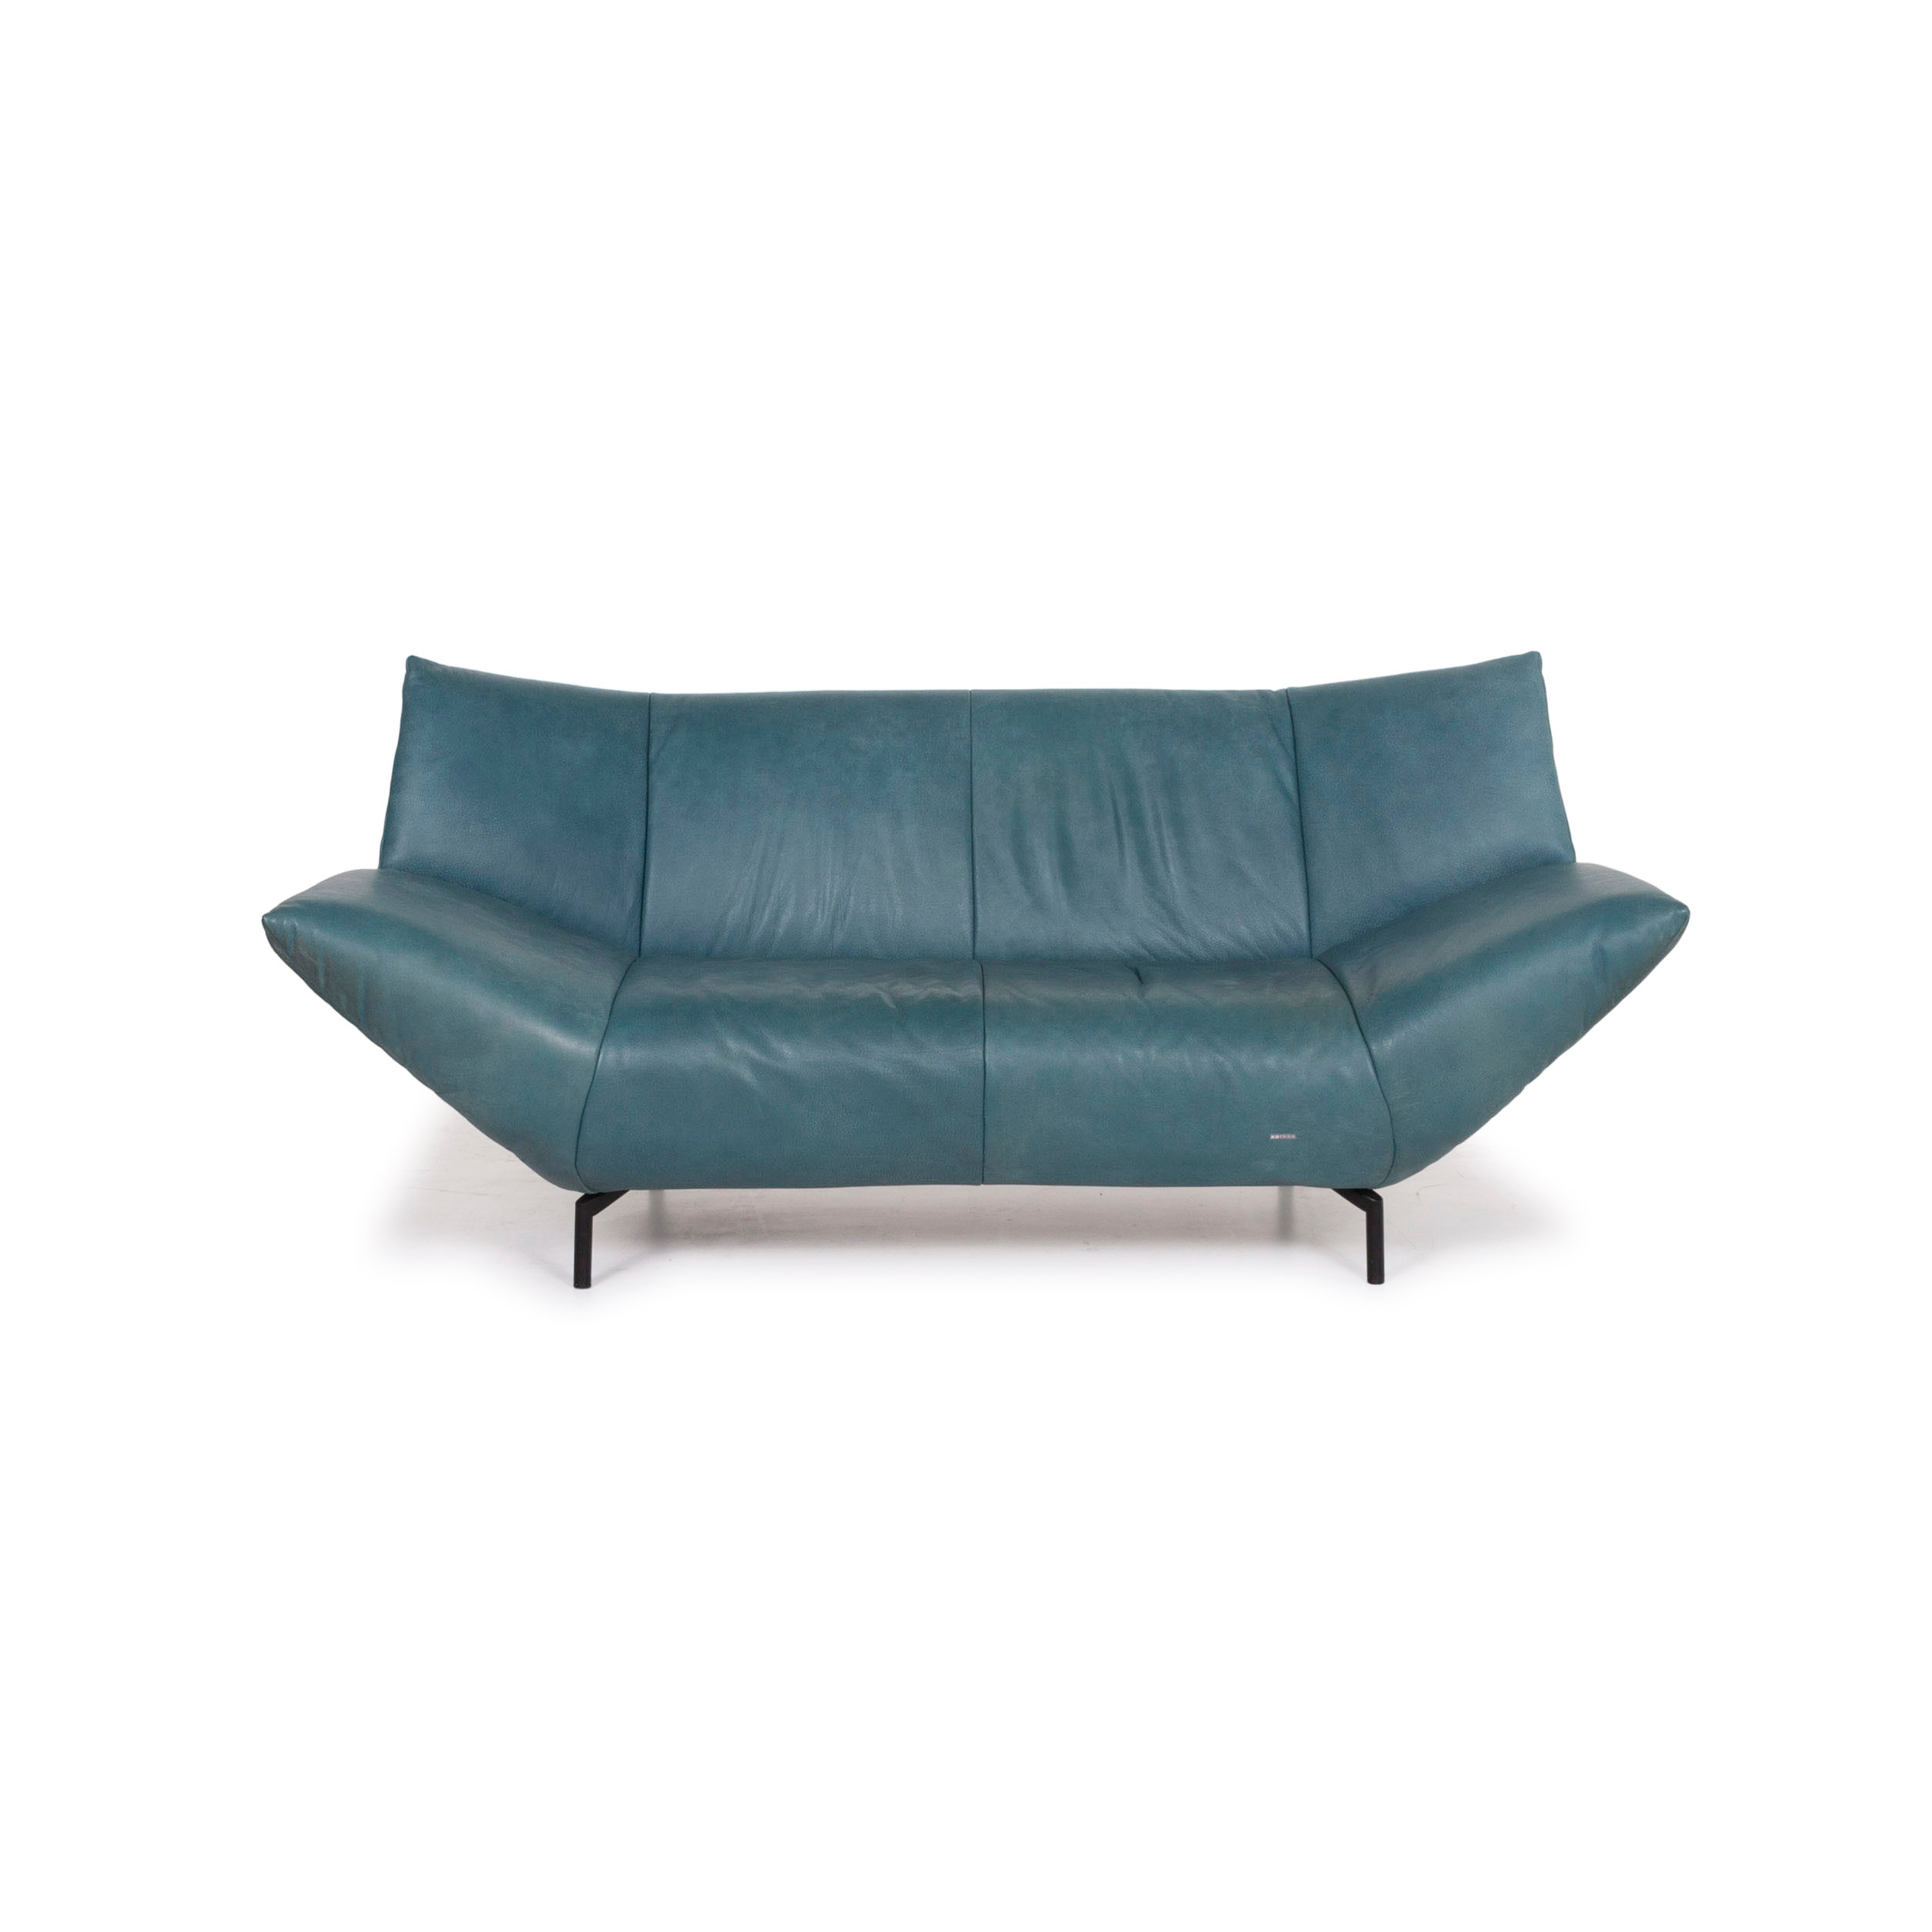 Full Size of Koinor Sofa Leder Grau Francis Gebraucht Schwarz Rot Couch Outlet Gera Lederfarben Erfahrungen Uk Bewertung Braun 2 Sitzer Preisliste Preis Kaufen Trkis Blau Sofa Koinor Sofa